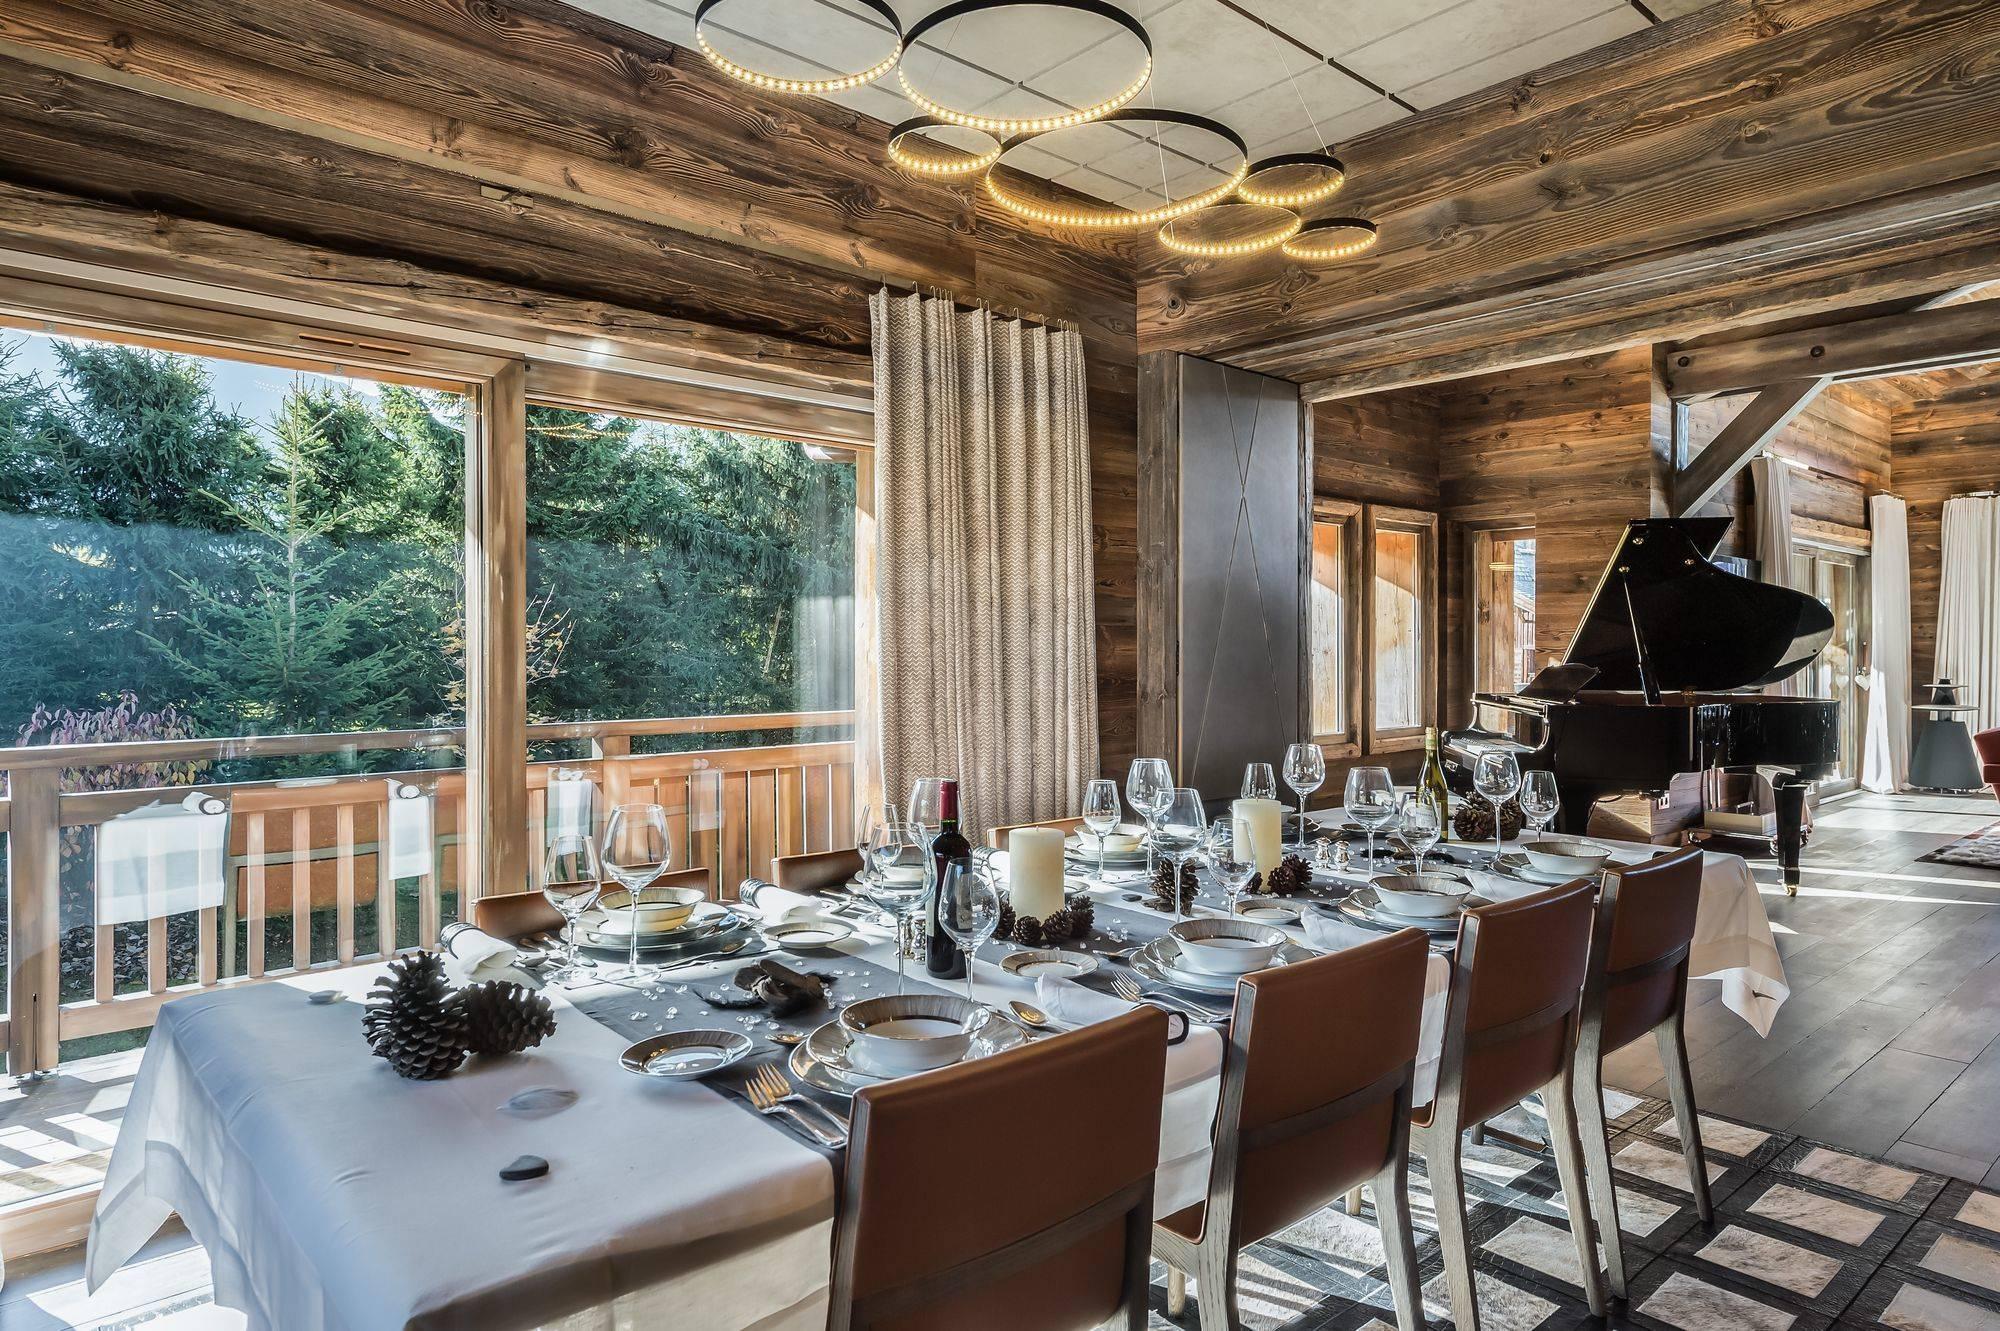 Lovelydays luxury service apartment rental - Megève - Senses Chalet - Partner - 6 bedrooms - 6 bathrooms - Dining living room - 005417110a2d - Lovelydays